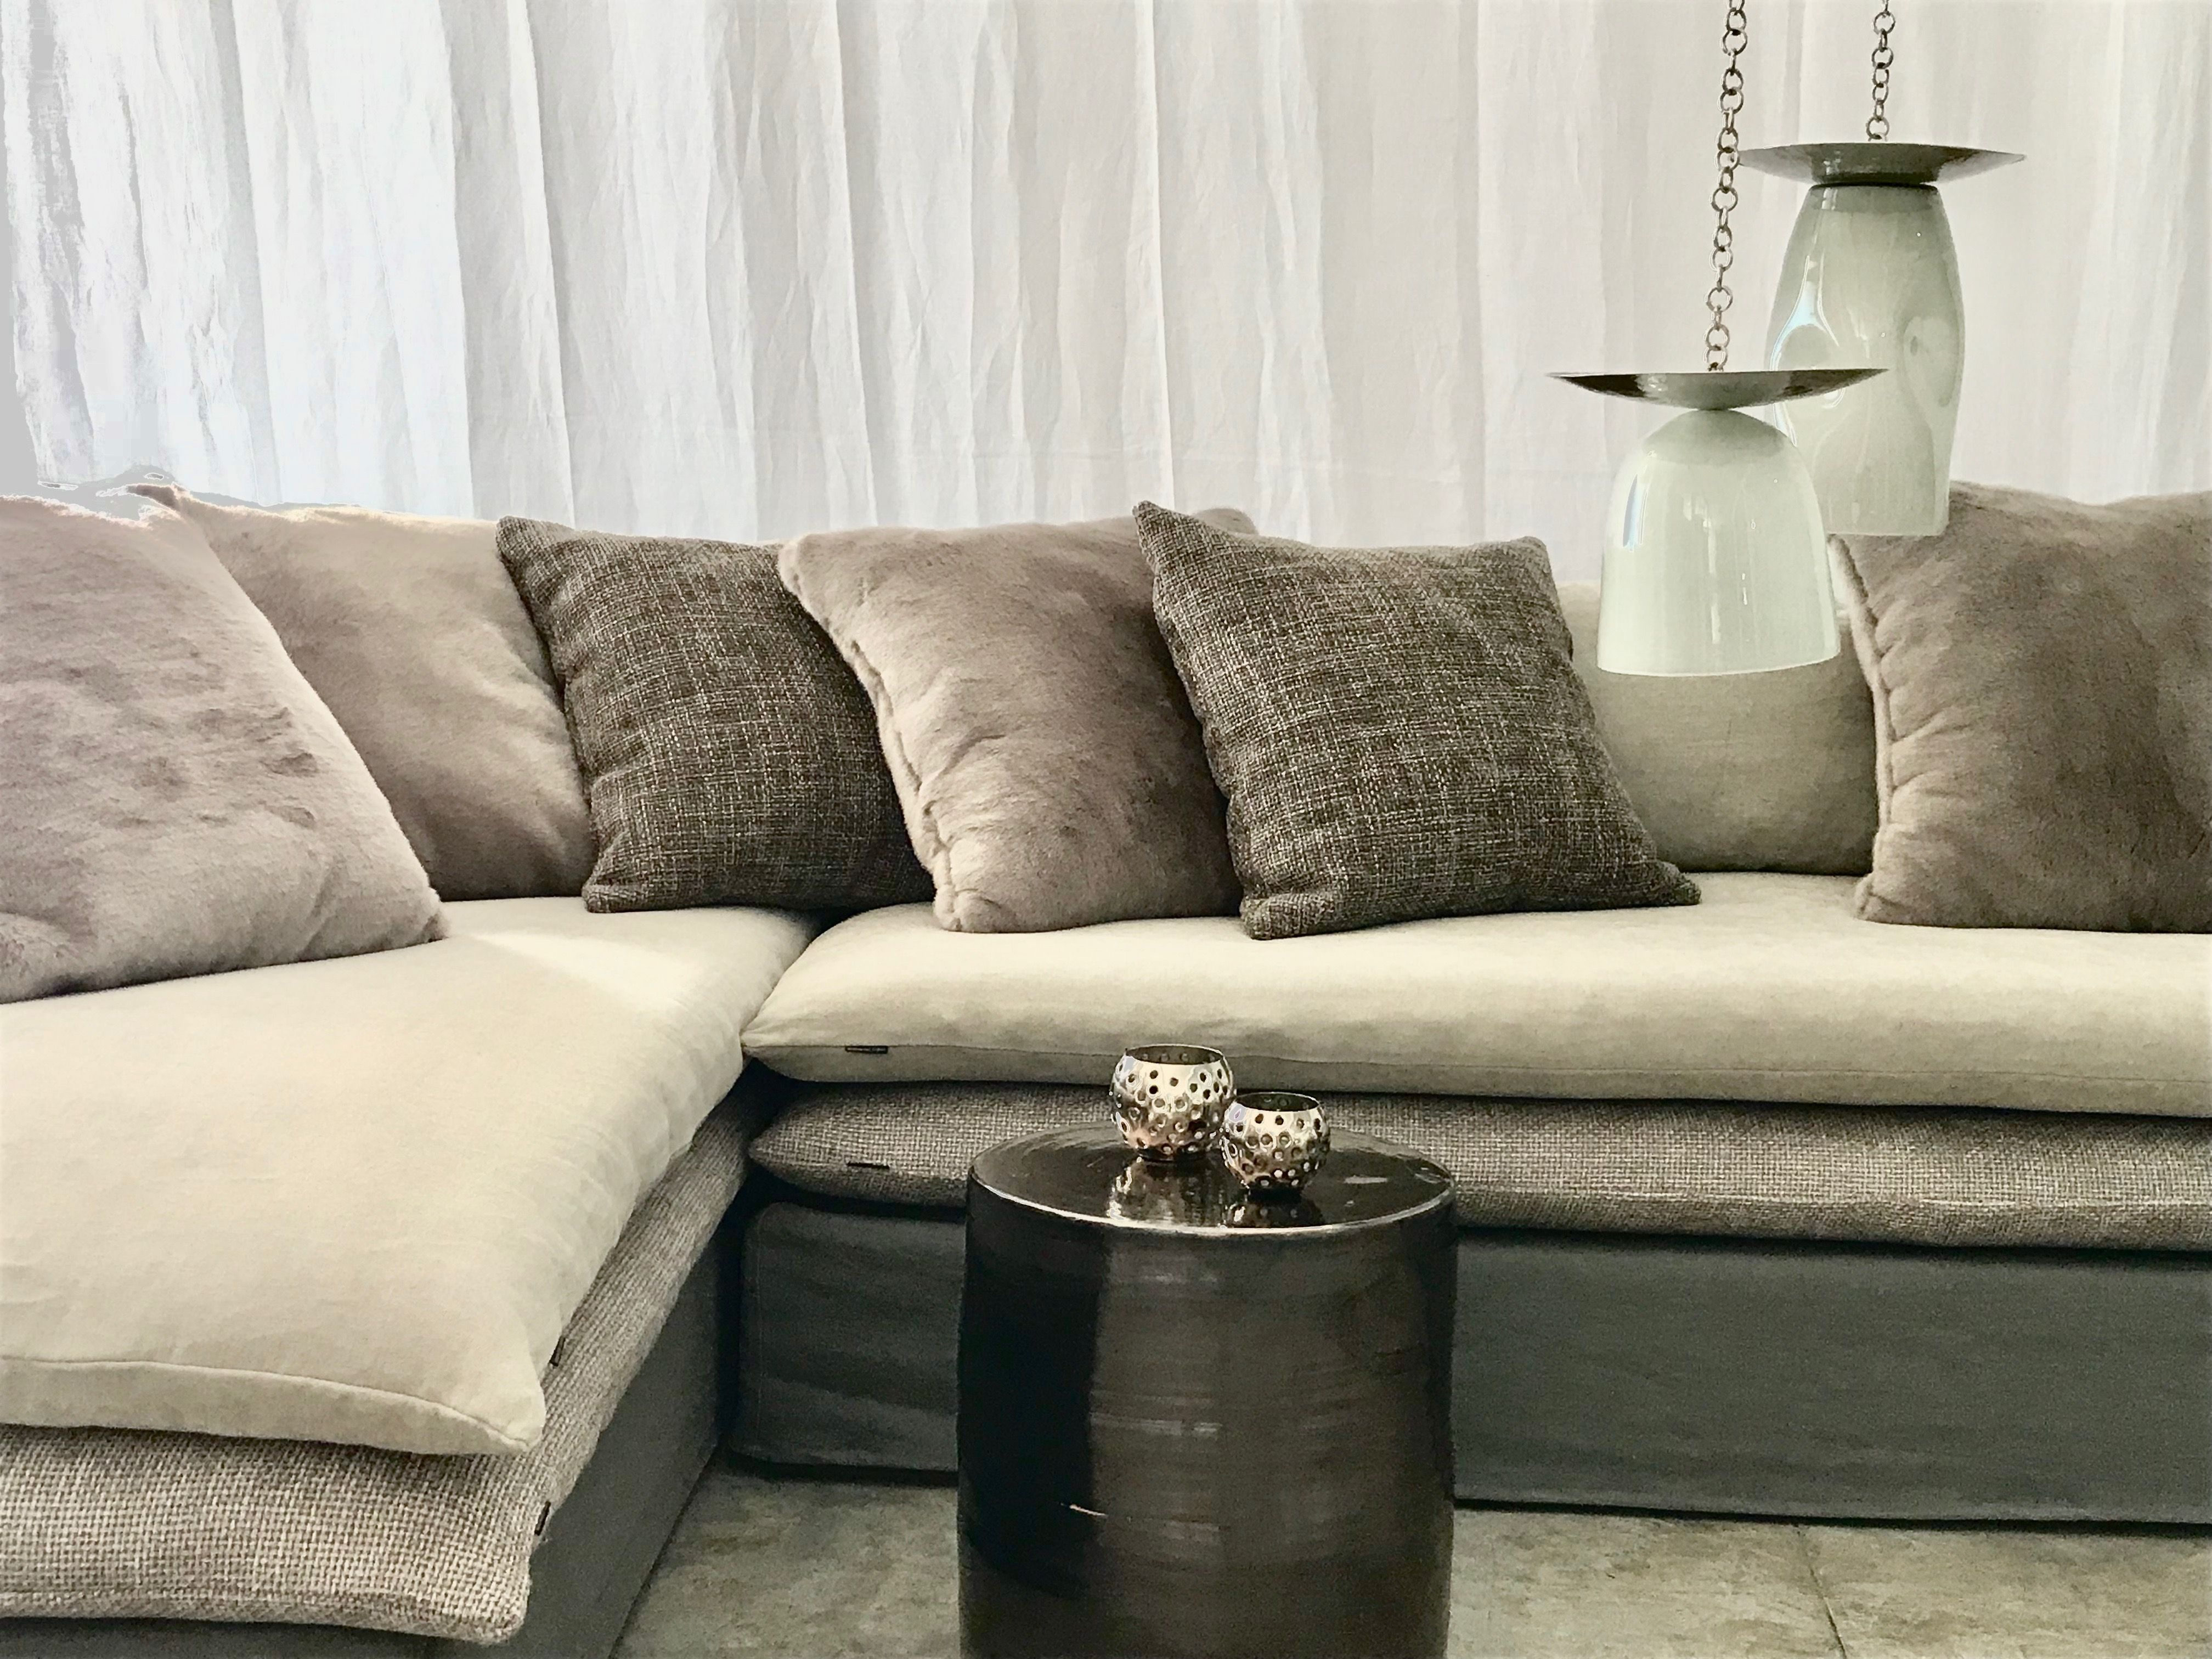 Canape Sur Mesure D Angle Lin Lave Beige Sable Canape Angle Canape Marocain Moderne Deco Salon Marocain